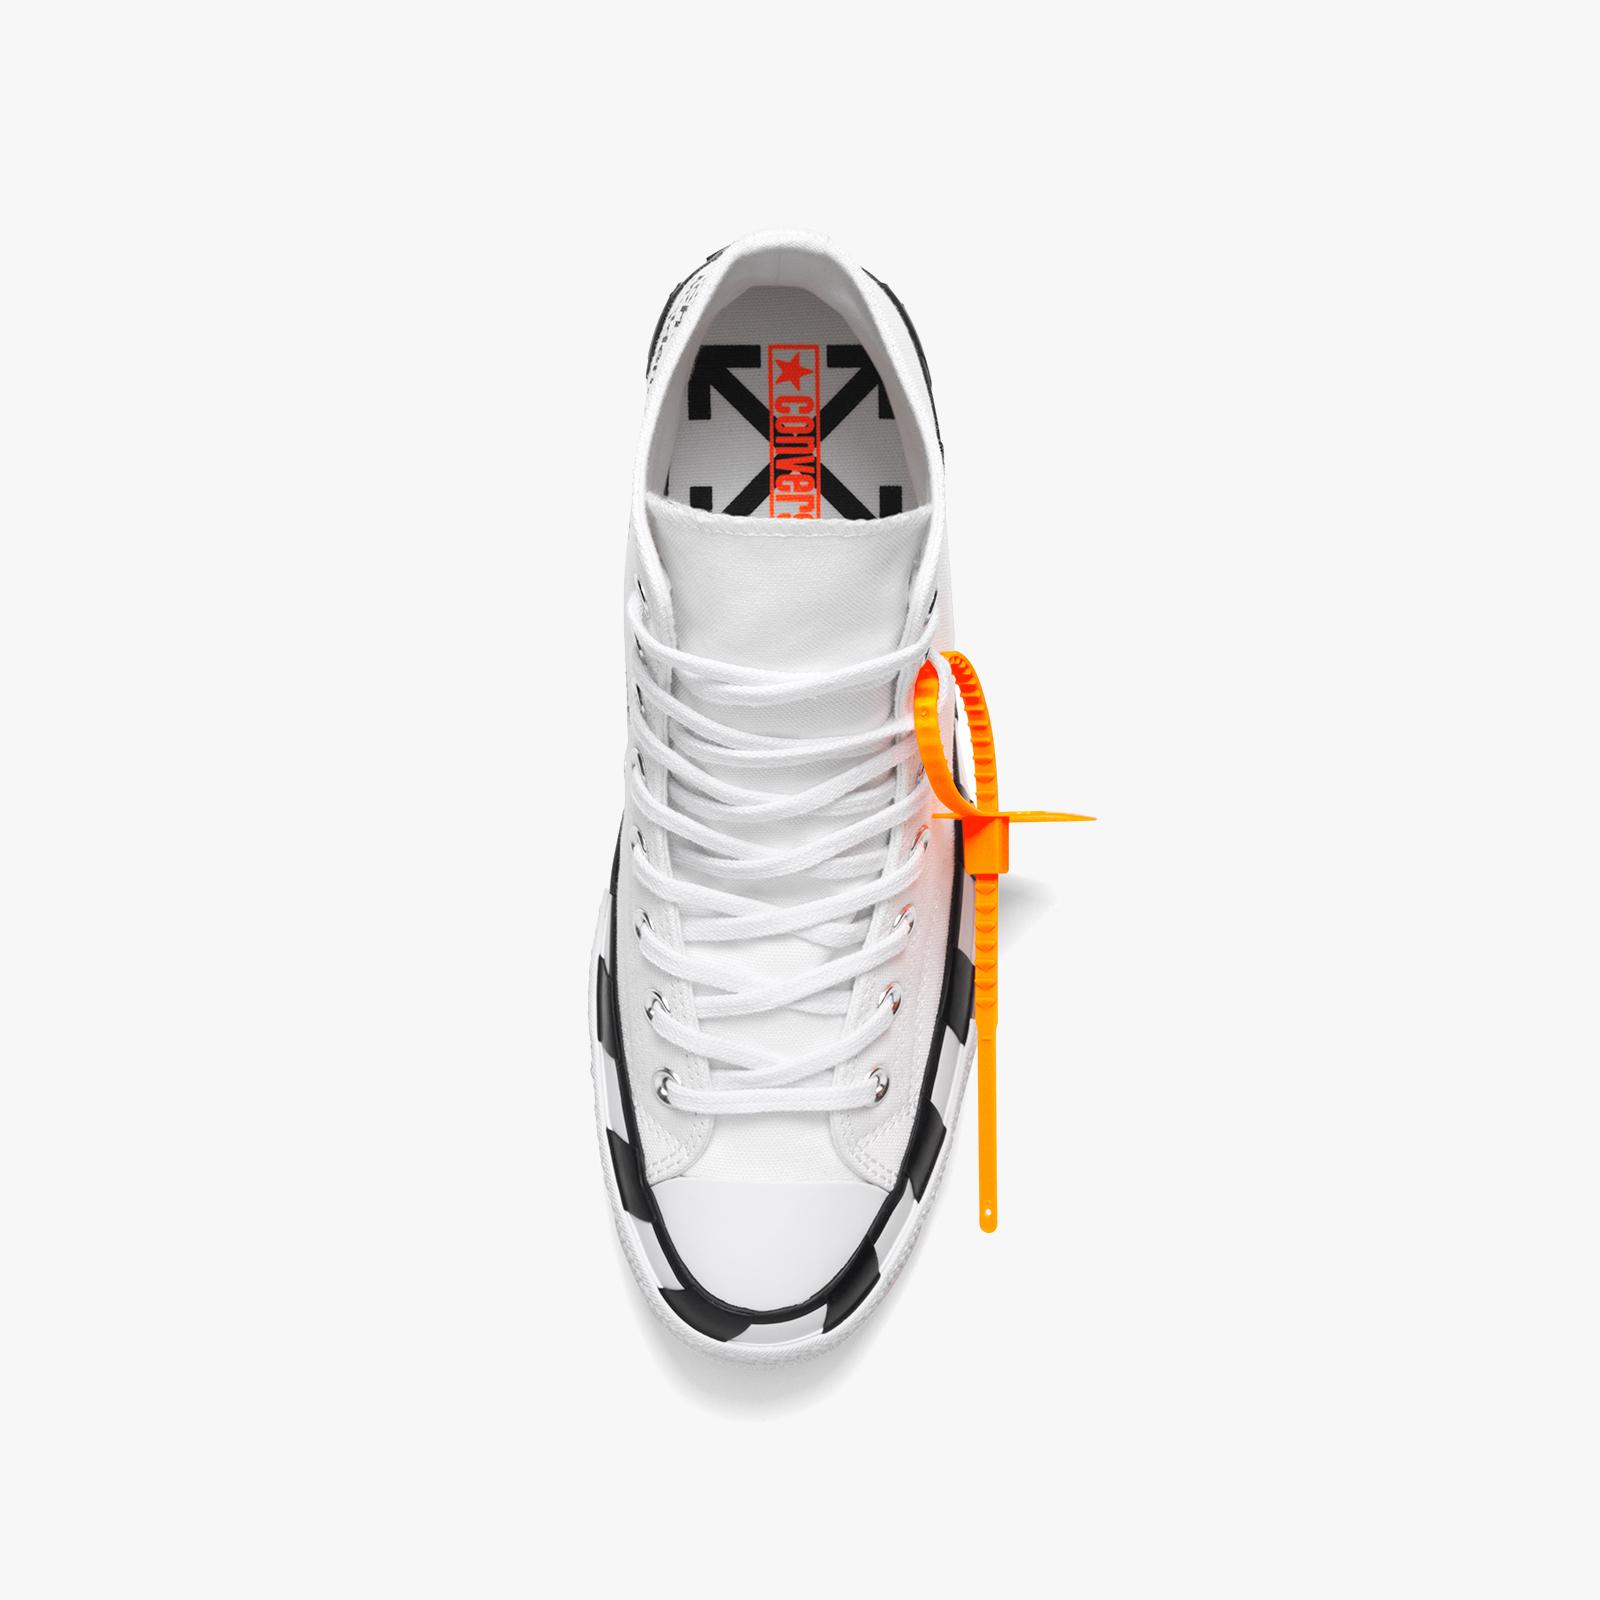 219025a1e75 Converse Chuck Taylor 70 x Off White - 163862c - Sneakersnstuff ...